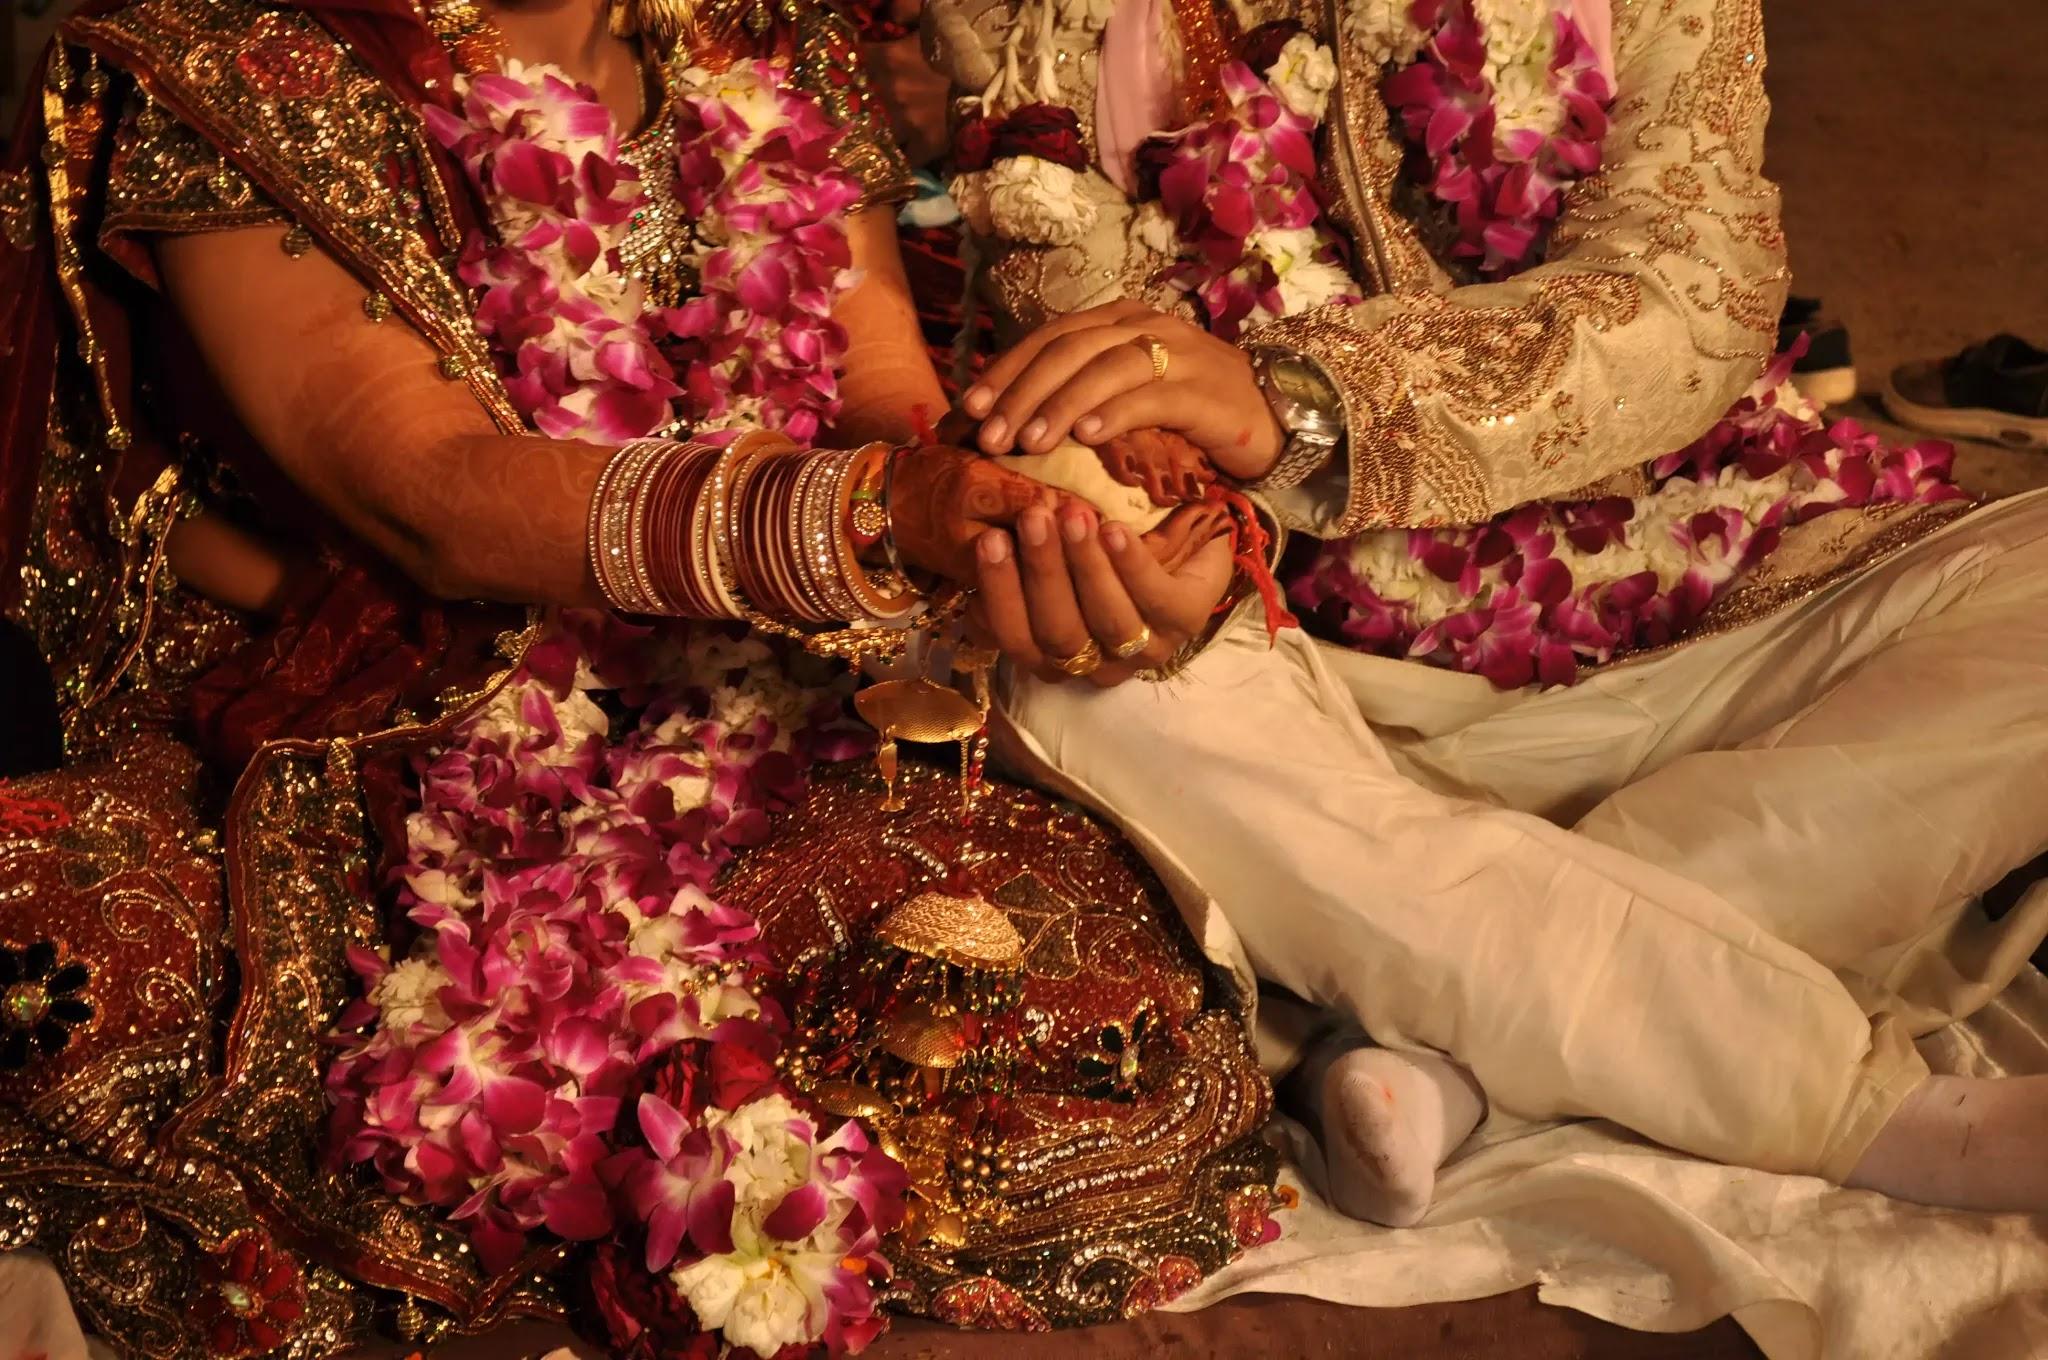 10 Most Common Taboos in Human Societies in Hindi